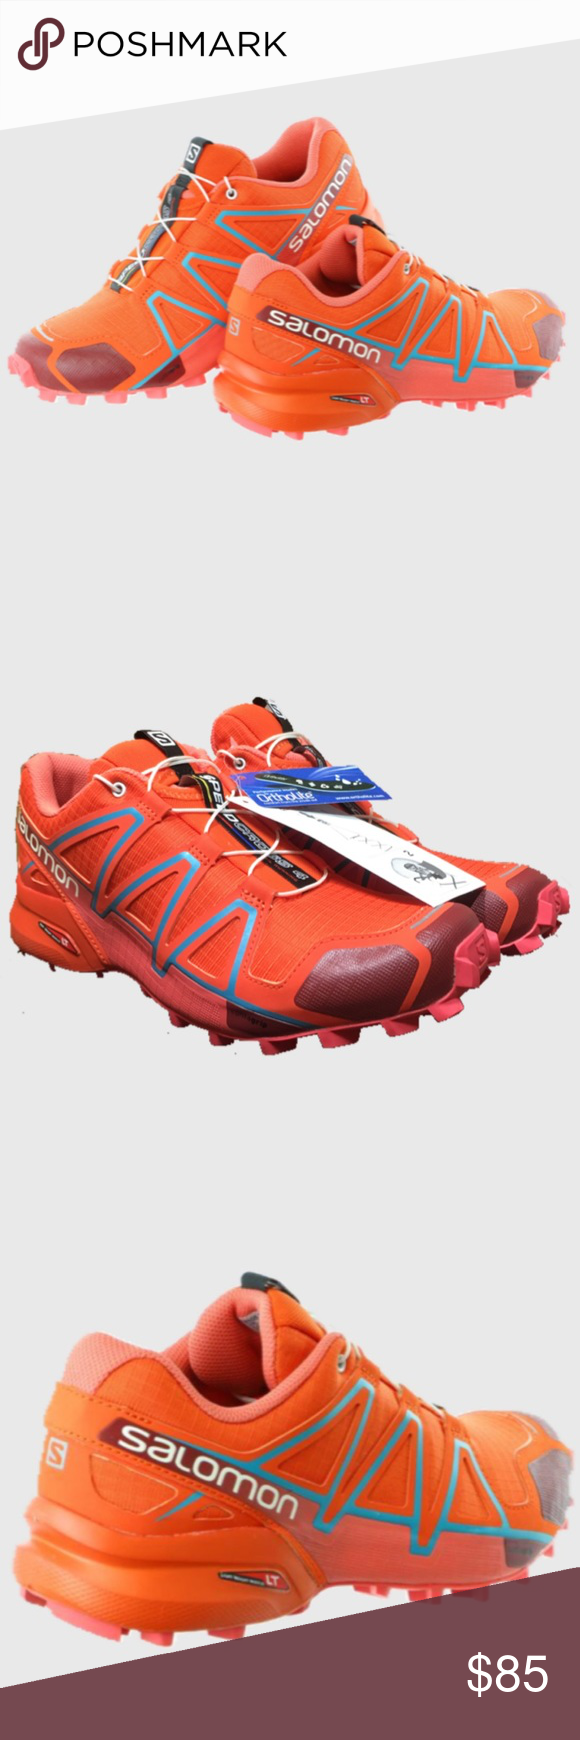 NWT Salomon Speedcross 4 Trail Running Shoes NWT Salomon